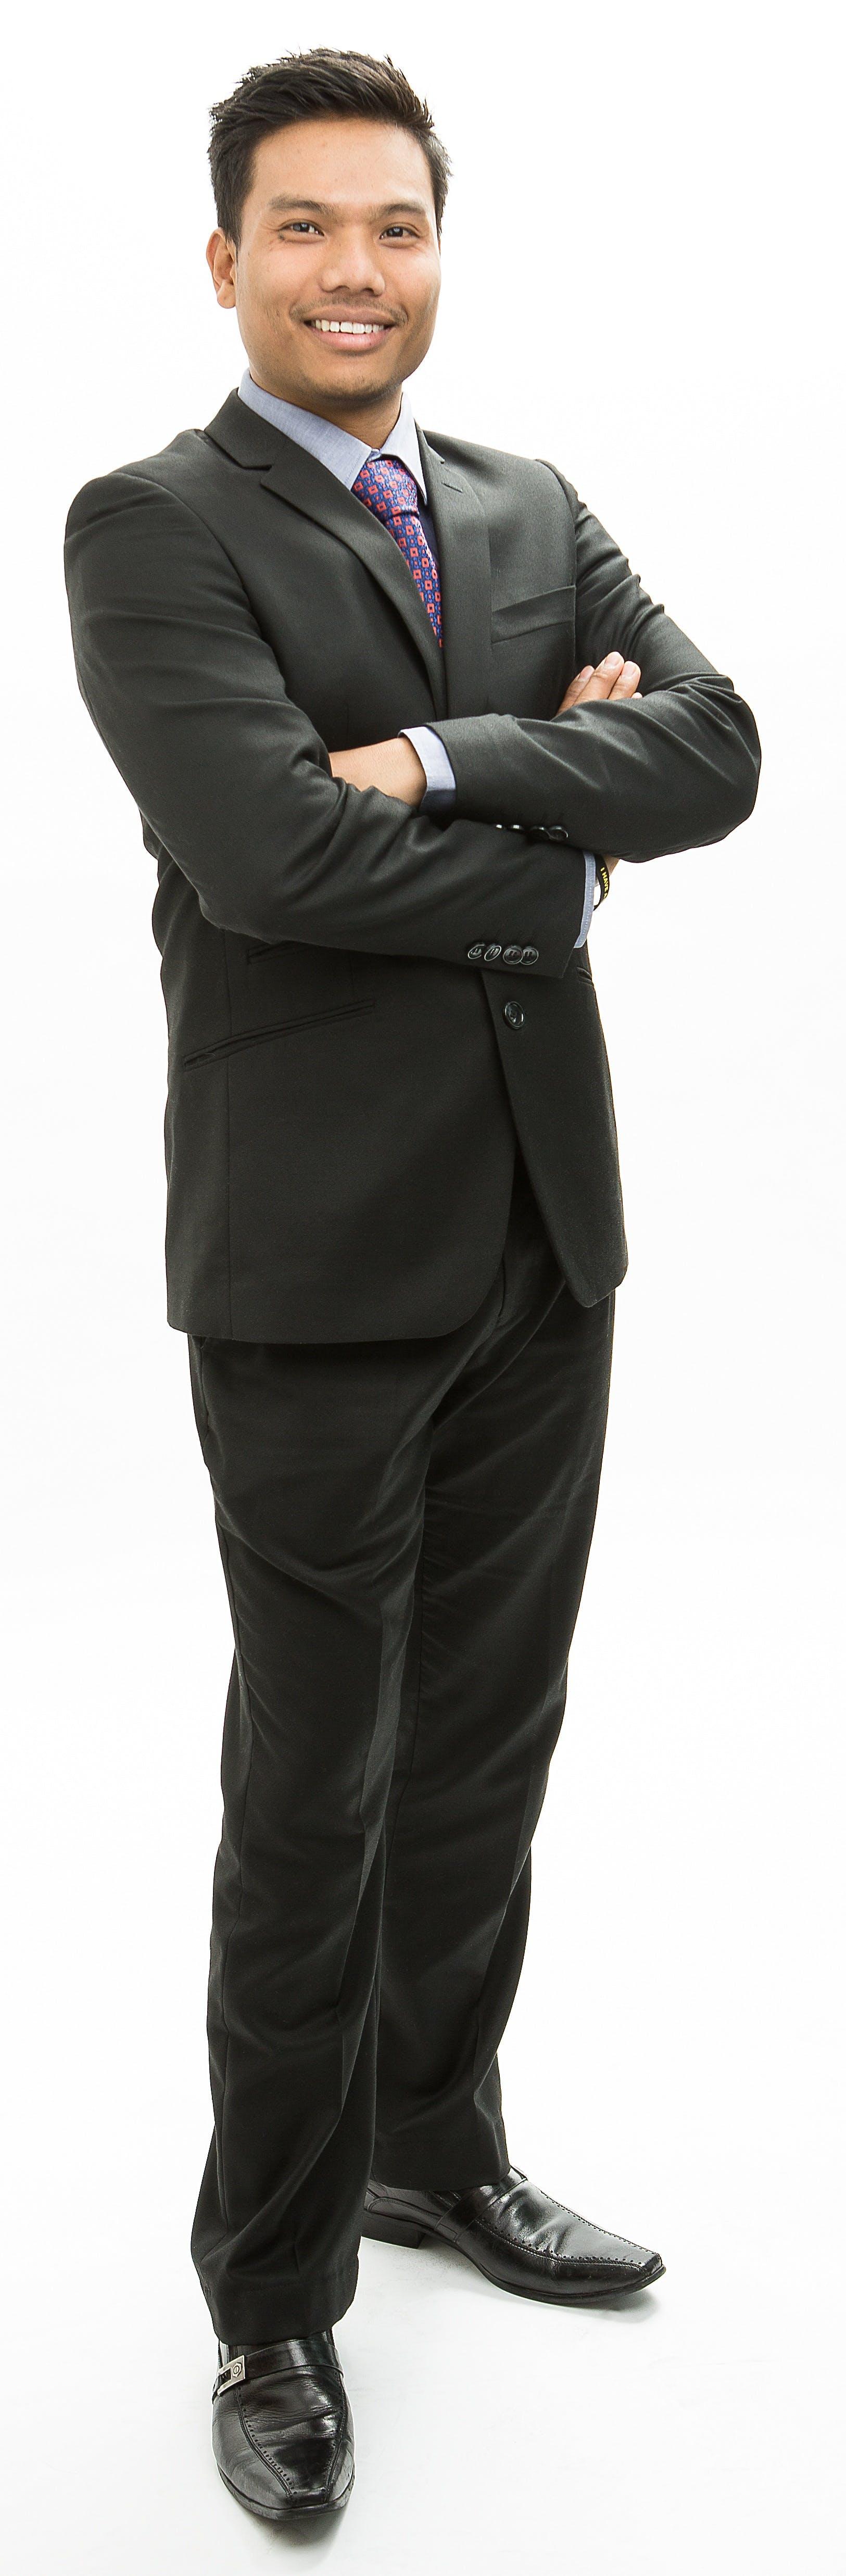 Free stock photo of businessman, suit, model, tie